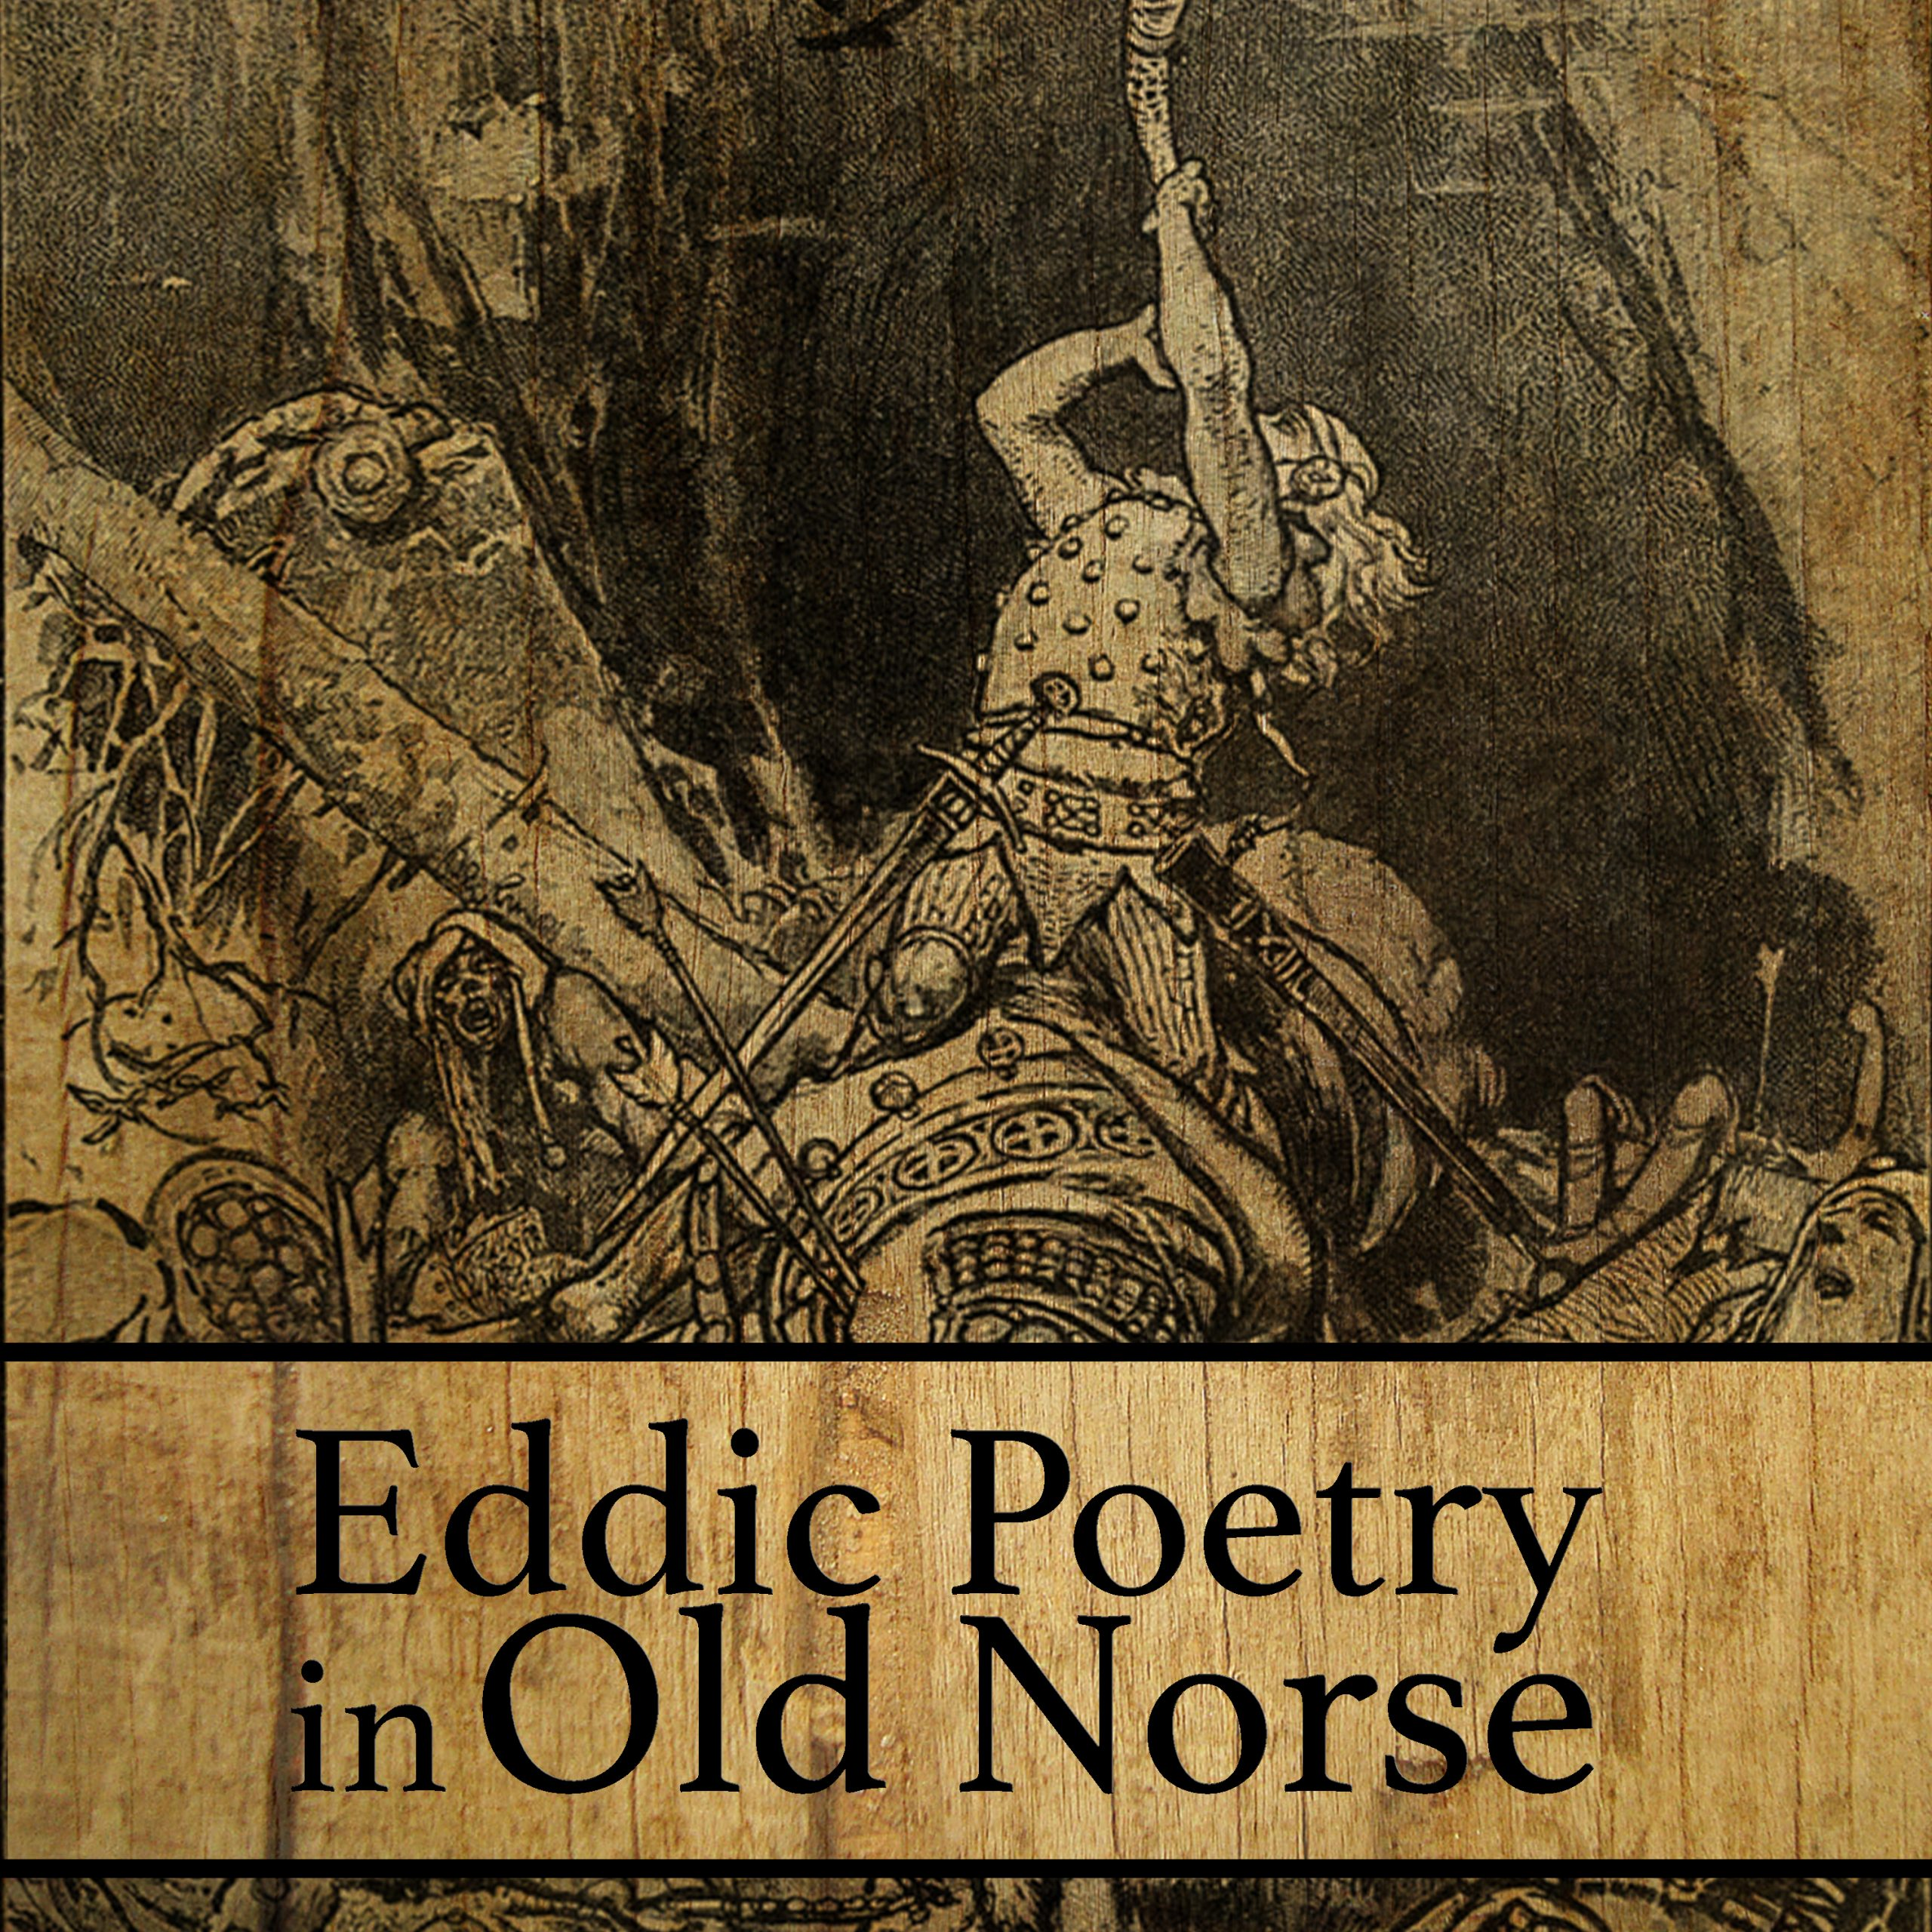 Eddic Poetry in Old Norse